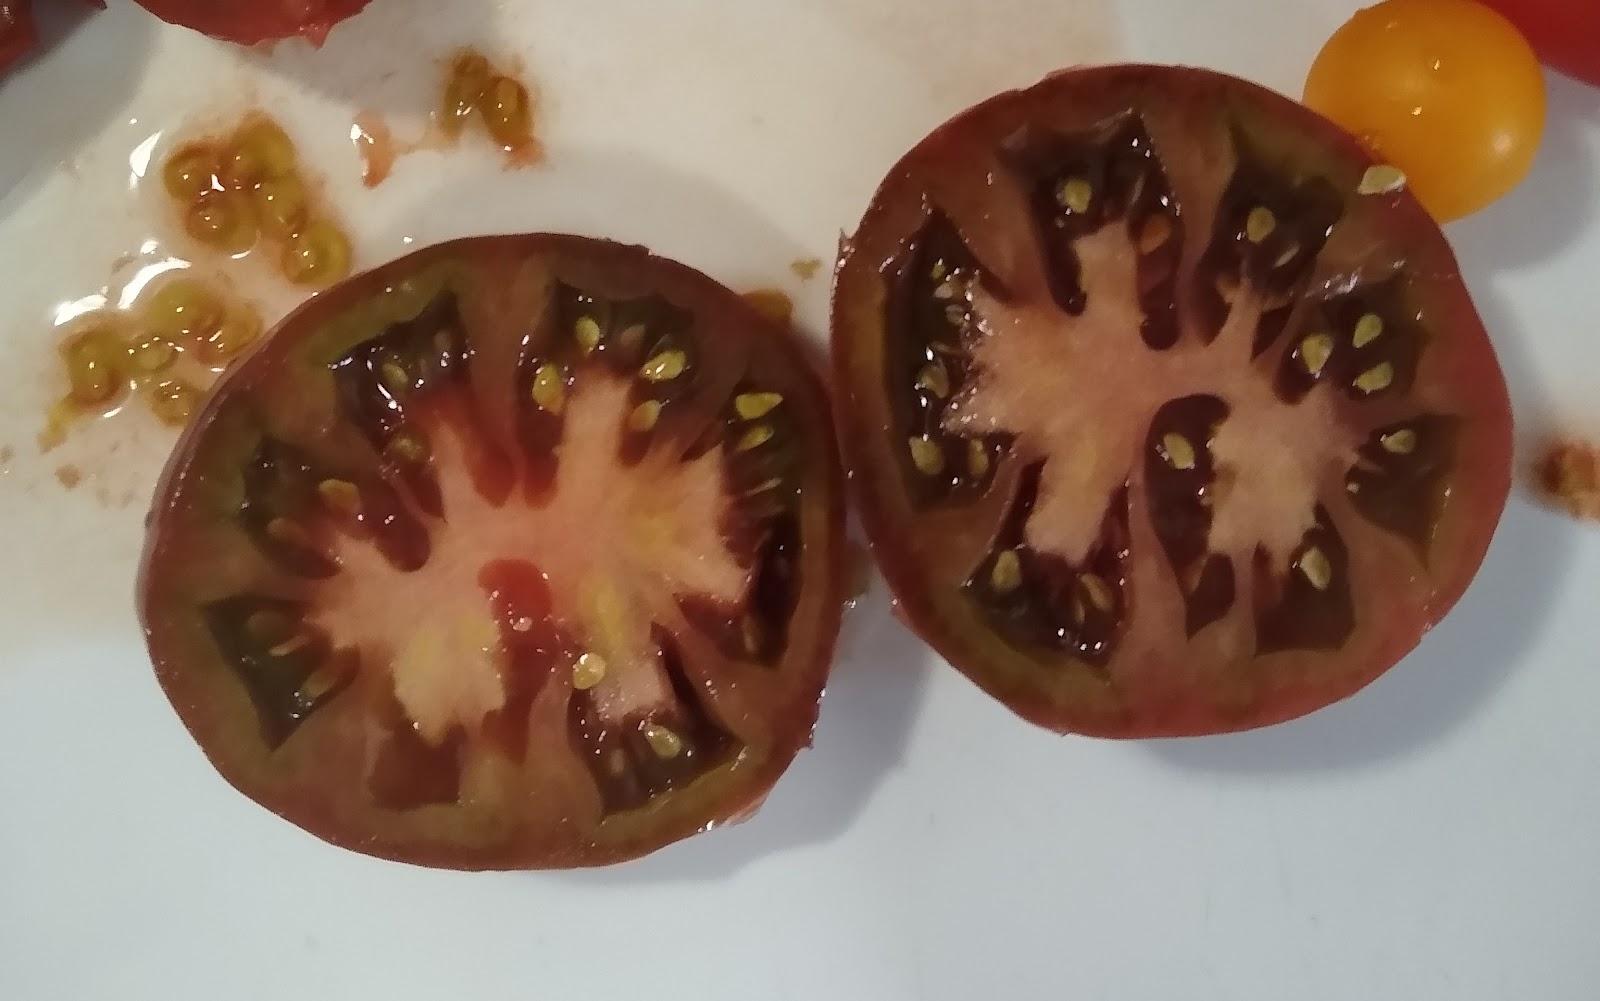 black brandywine tomato picture